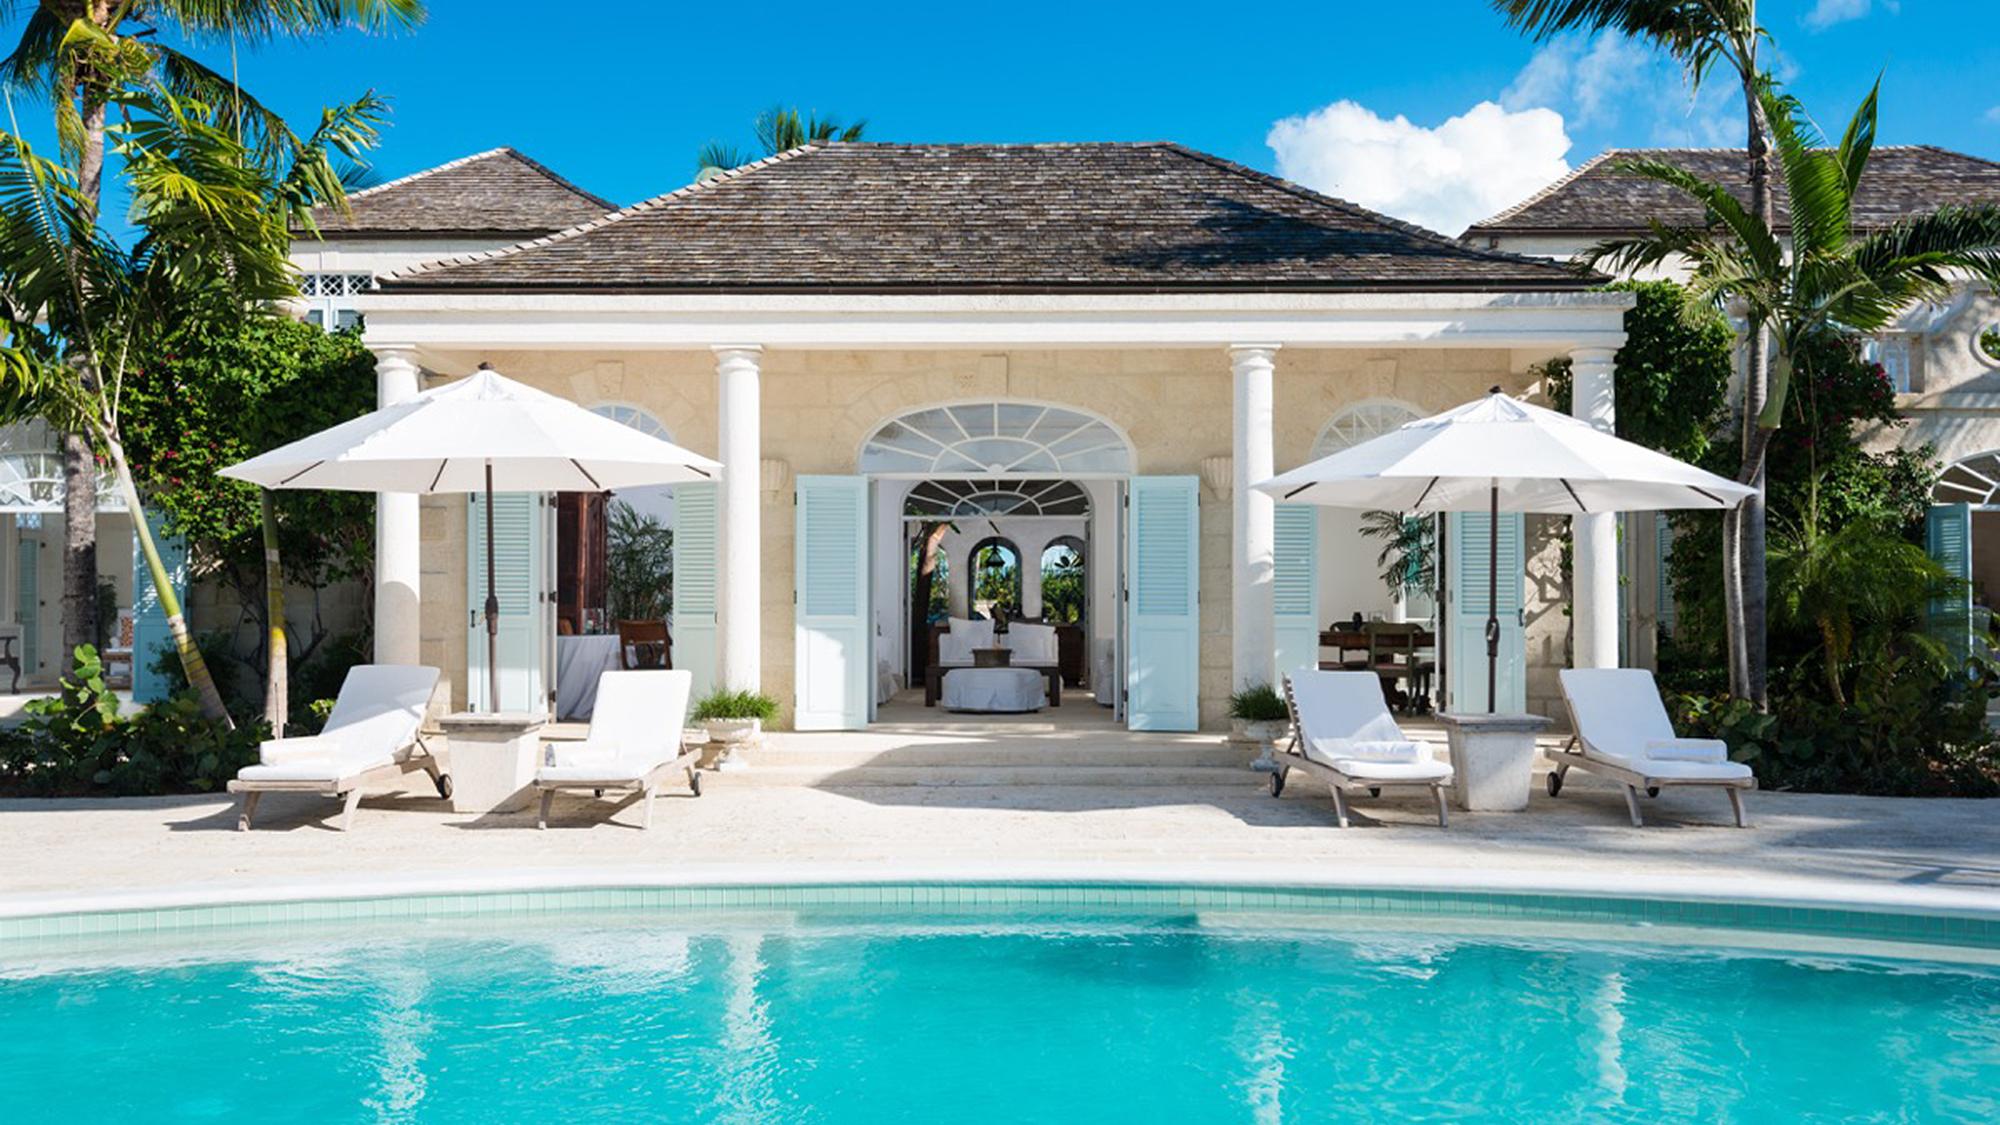 Villas Of Distinction Sweetens Pot For Agents Expanding